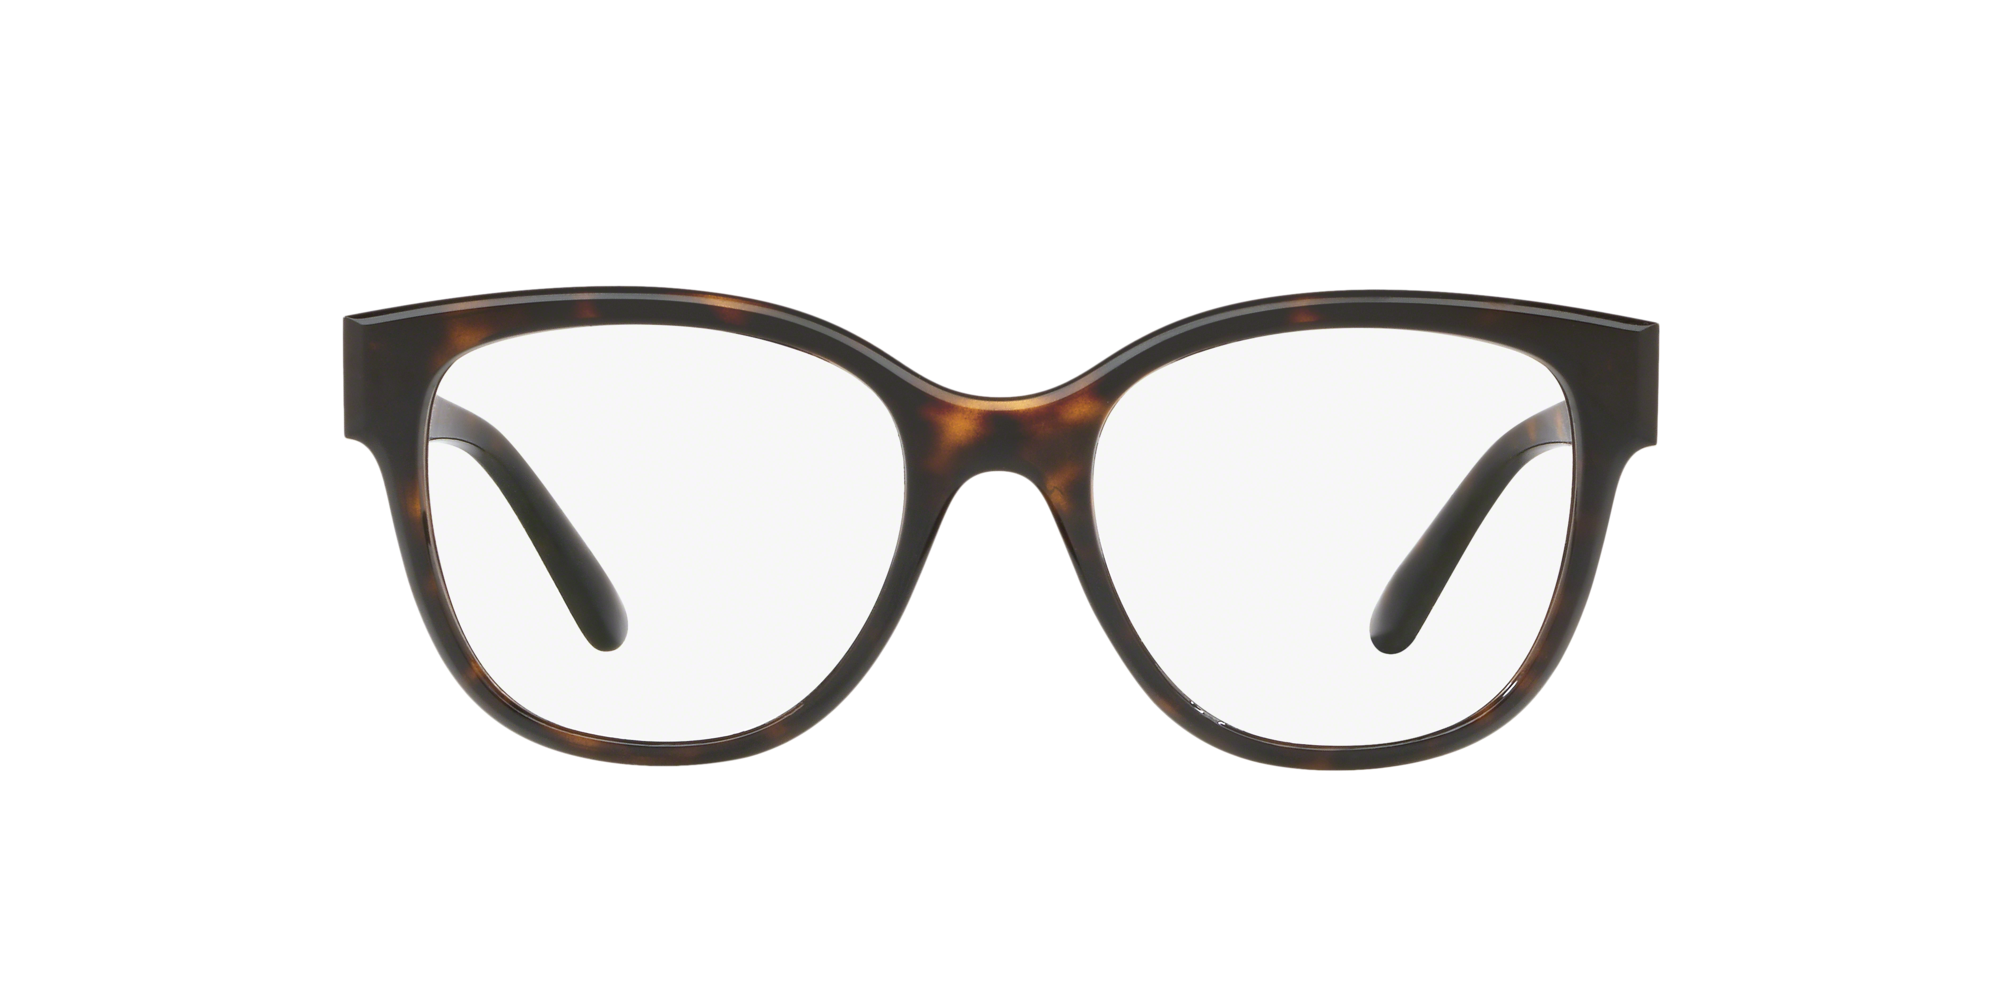 Image for DG5040 from LensCrafters | Glasses, Prescription Glasses Online, Eyewear